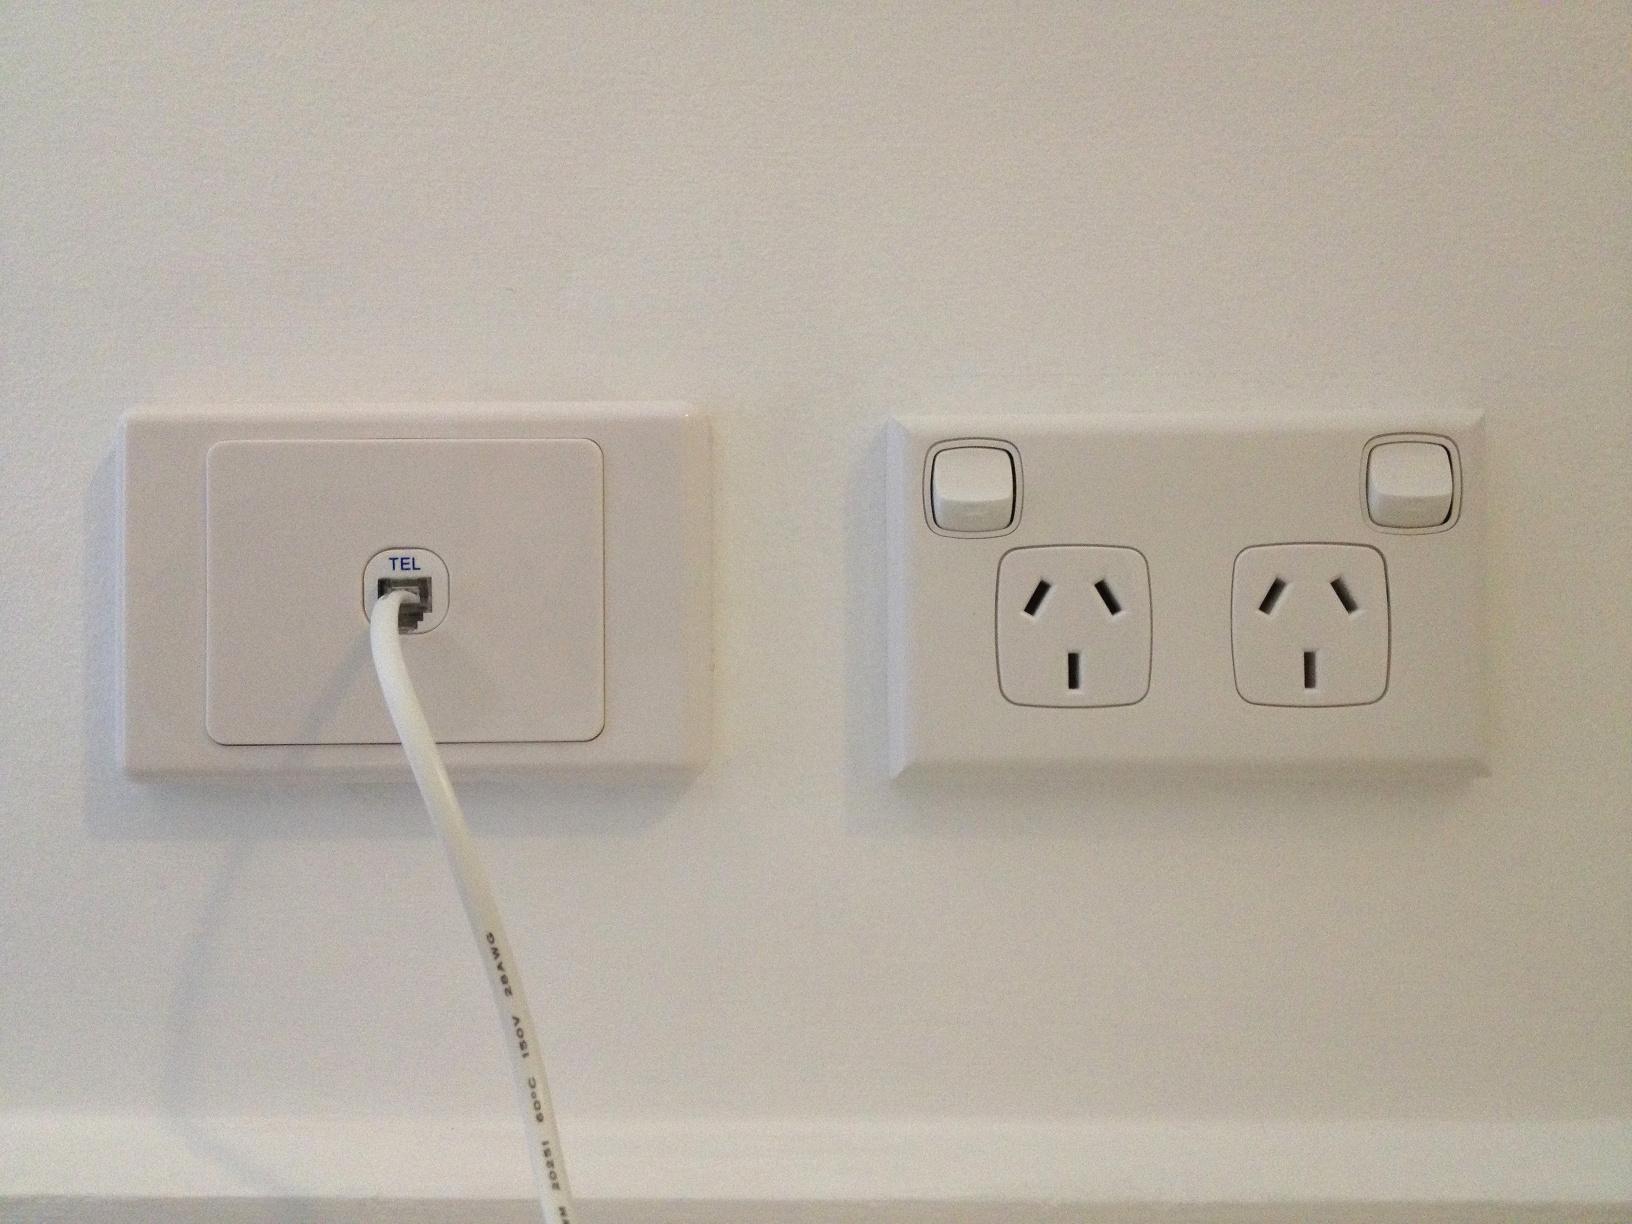 upgrading a 600 series phone socket to rj11 tp69 socket outlet google on australian telephone wall socket wiring [ 1632 x 1224 Pixel ]